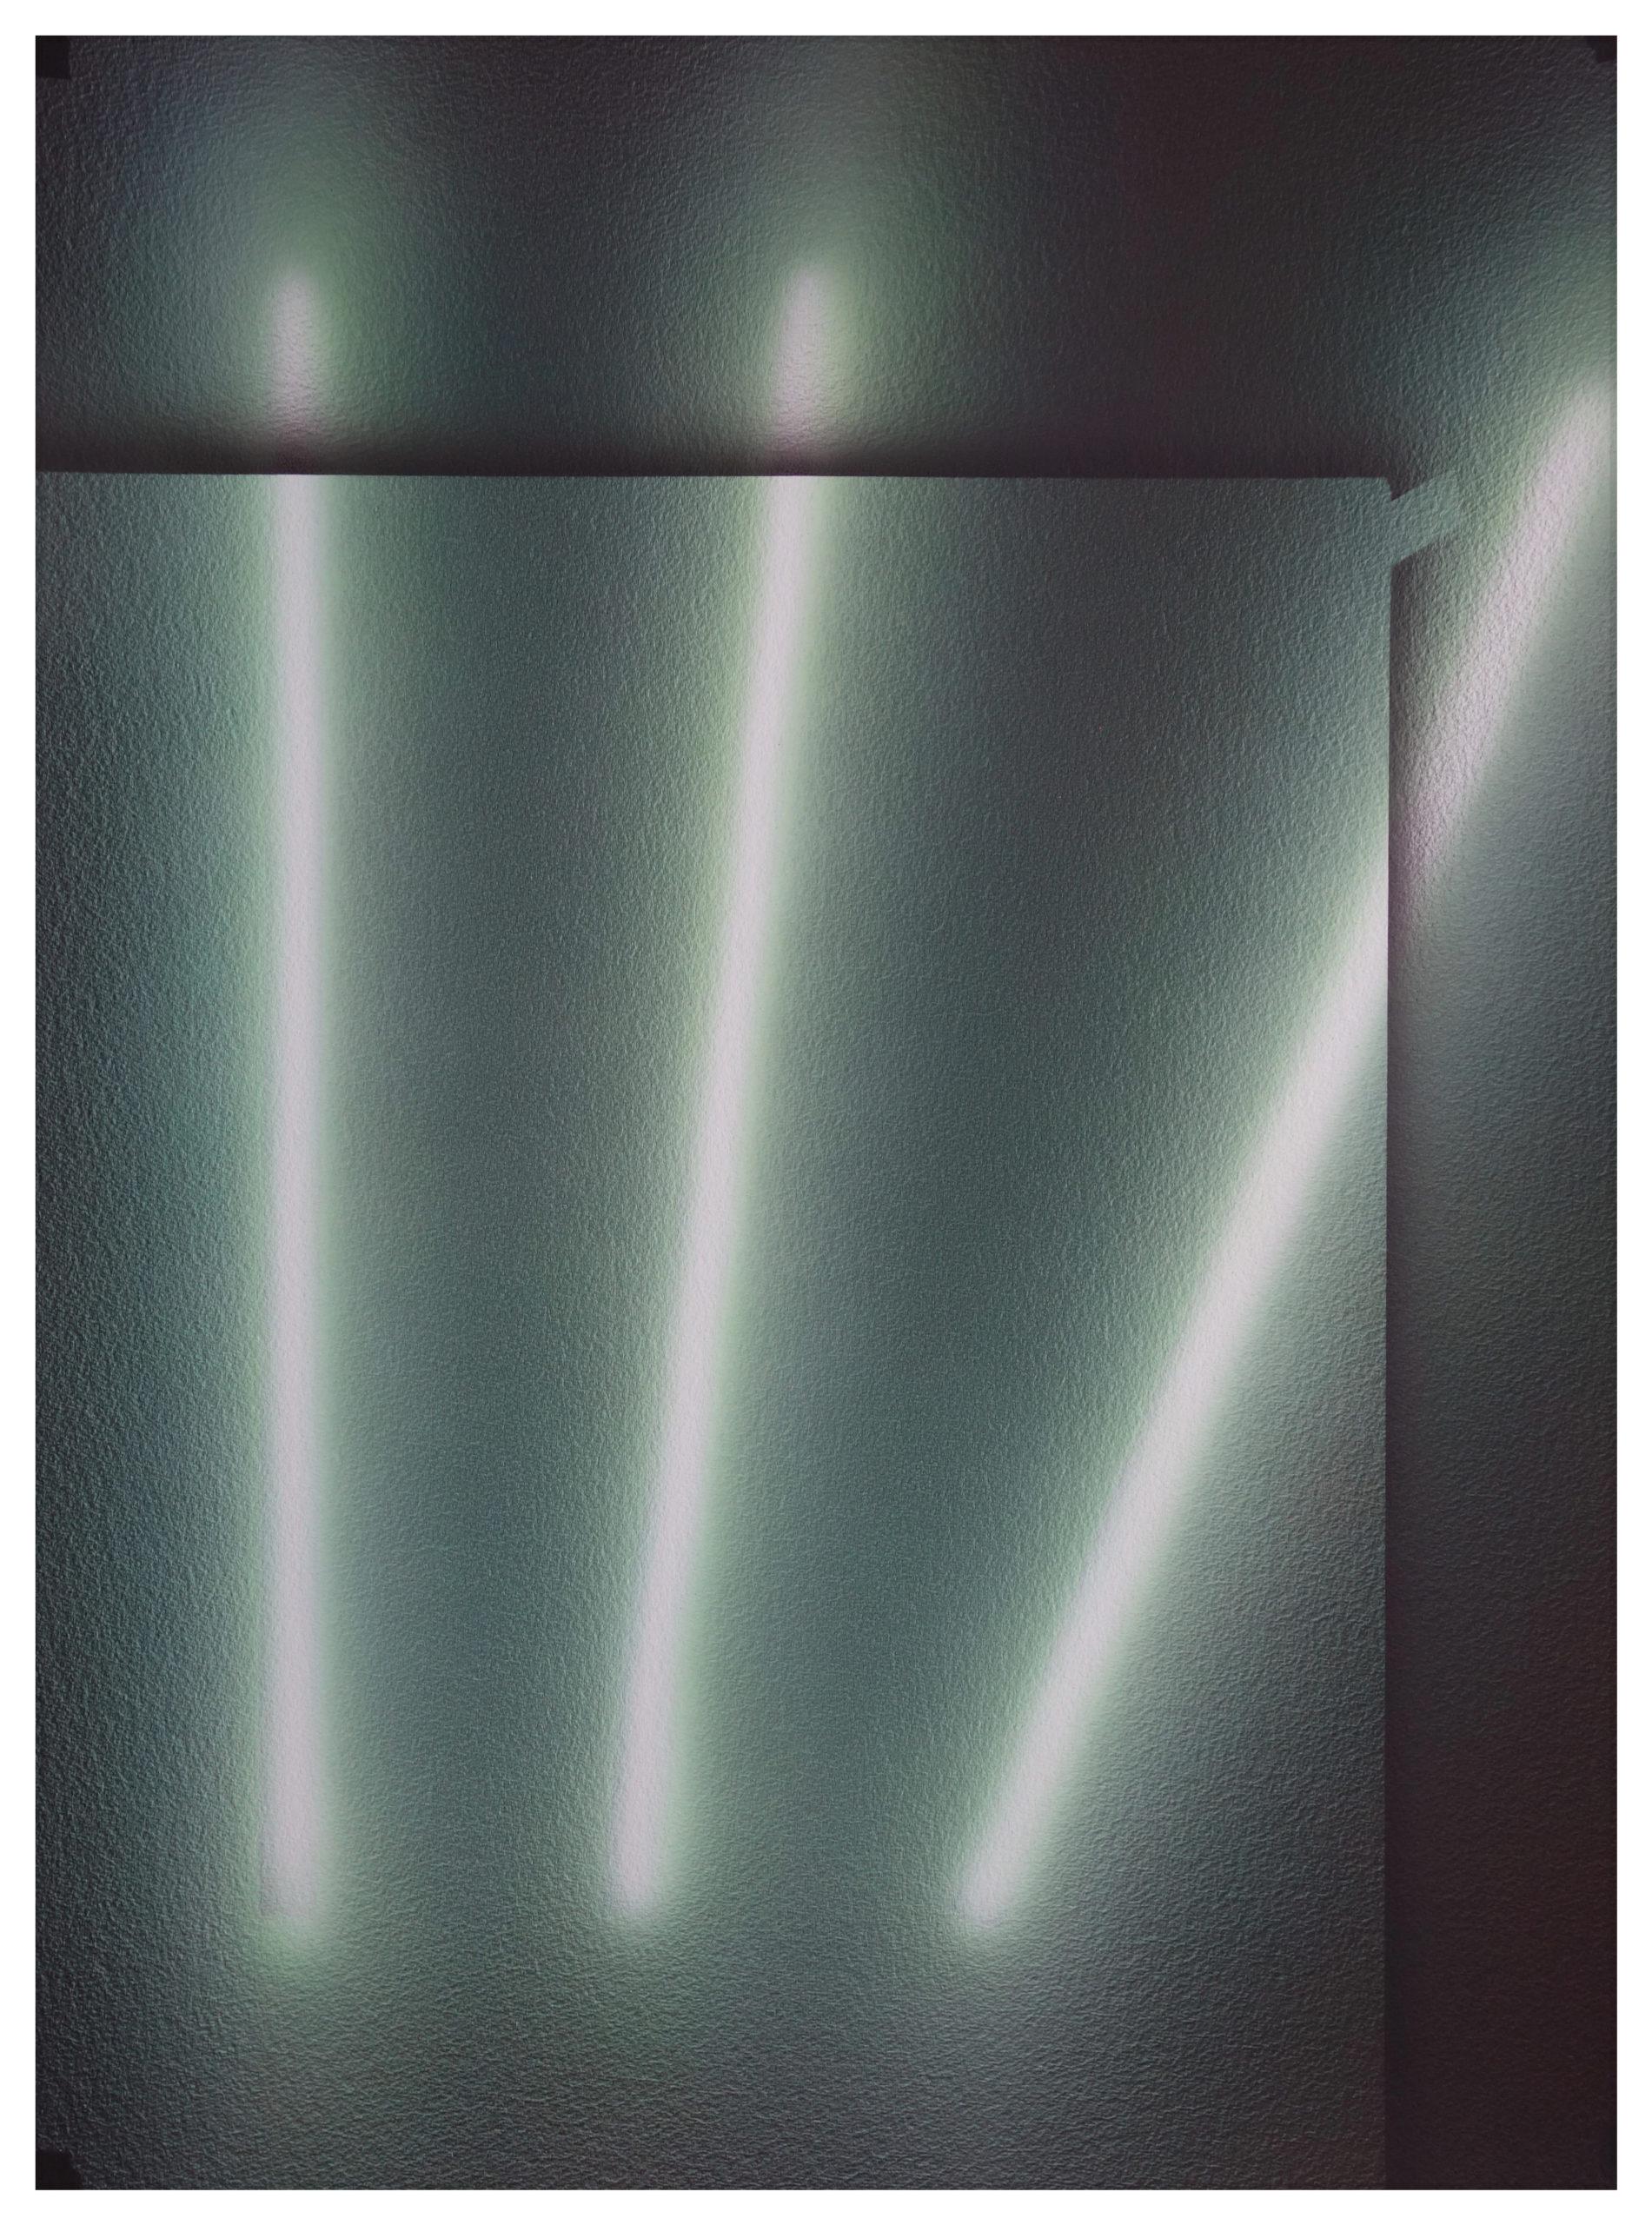 Nicolas Delprat, Dan, Put Back 4 acrylique sur papier 77×55,7 cm 2018, courtesy Nicolas Delprat